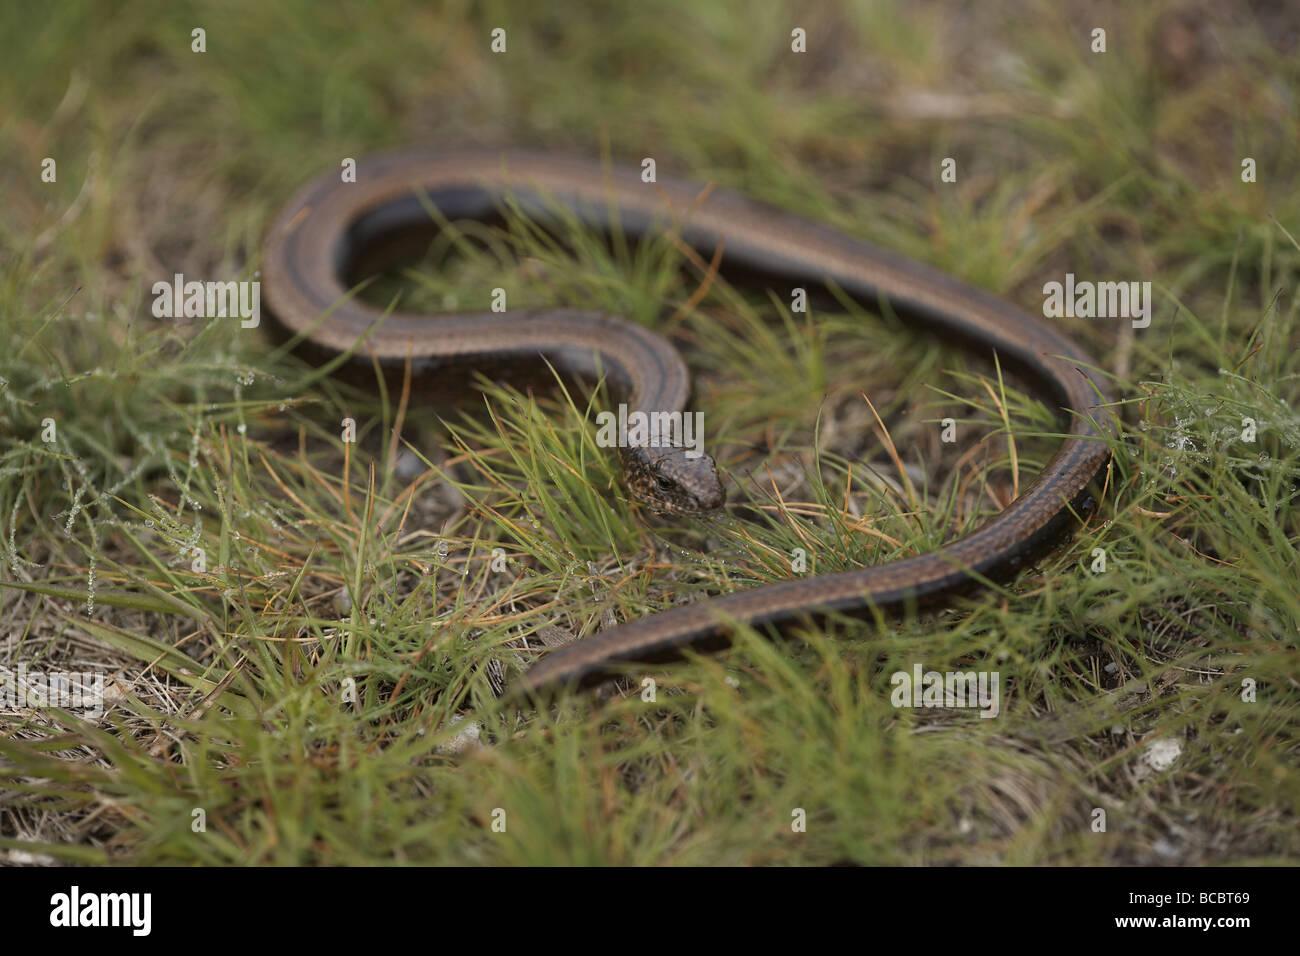 European slow worm Anguis fragilis or blindworm Stock Photo